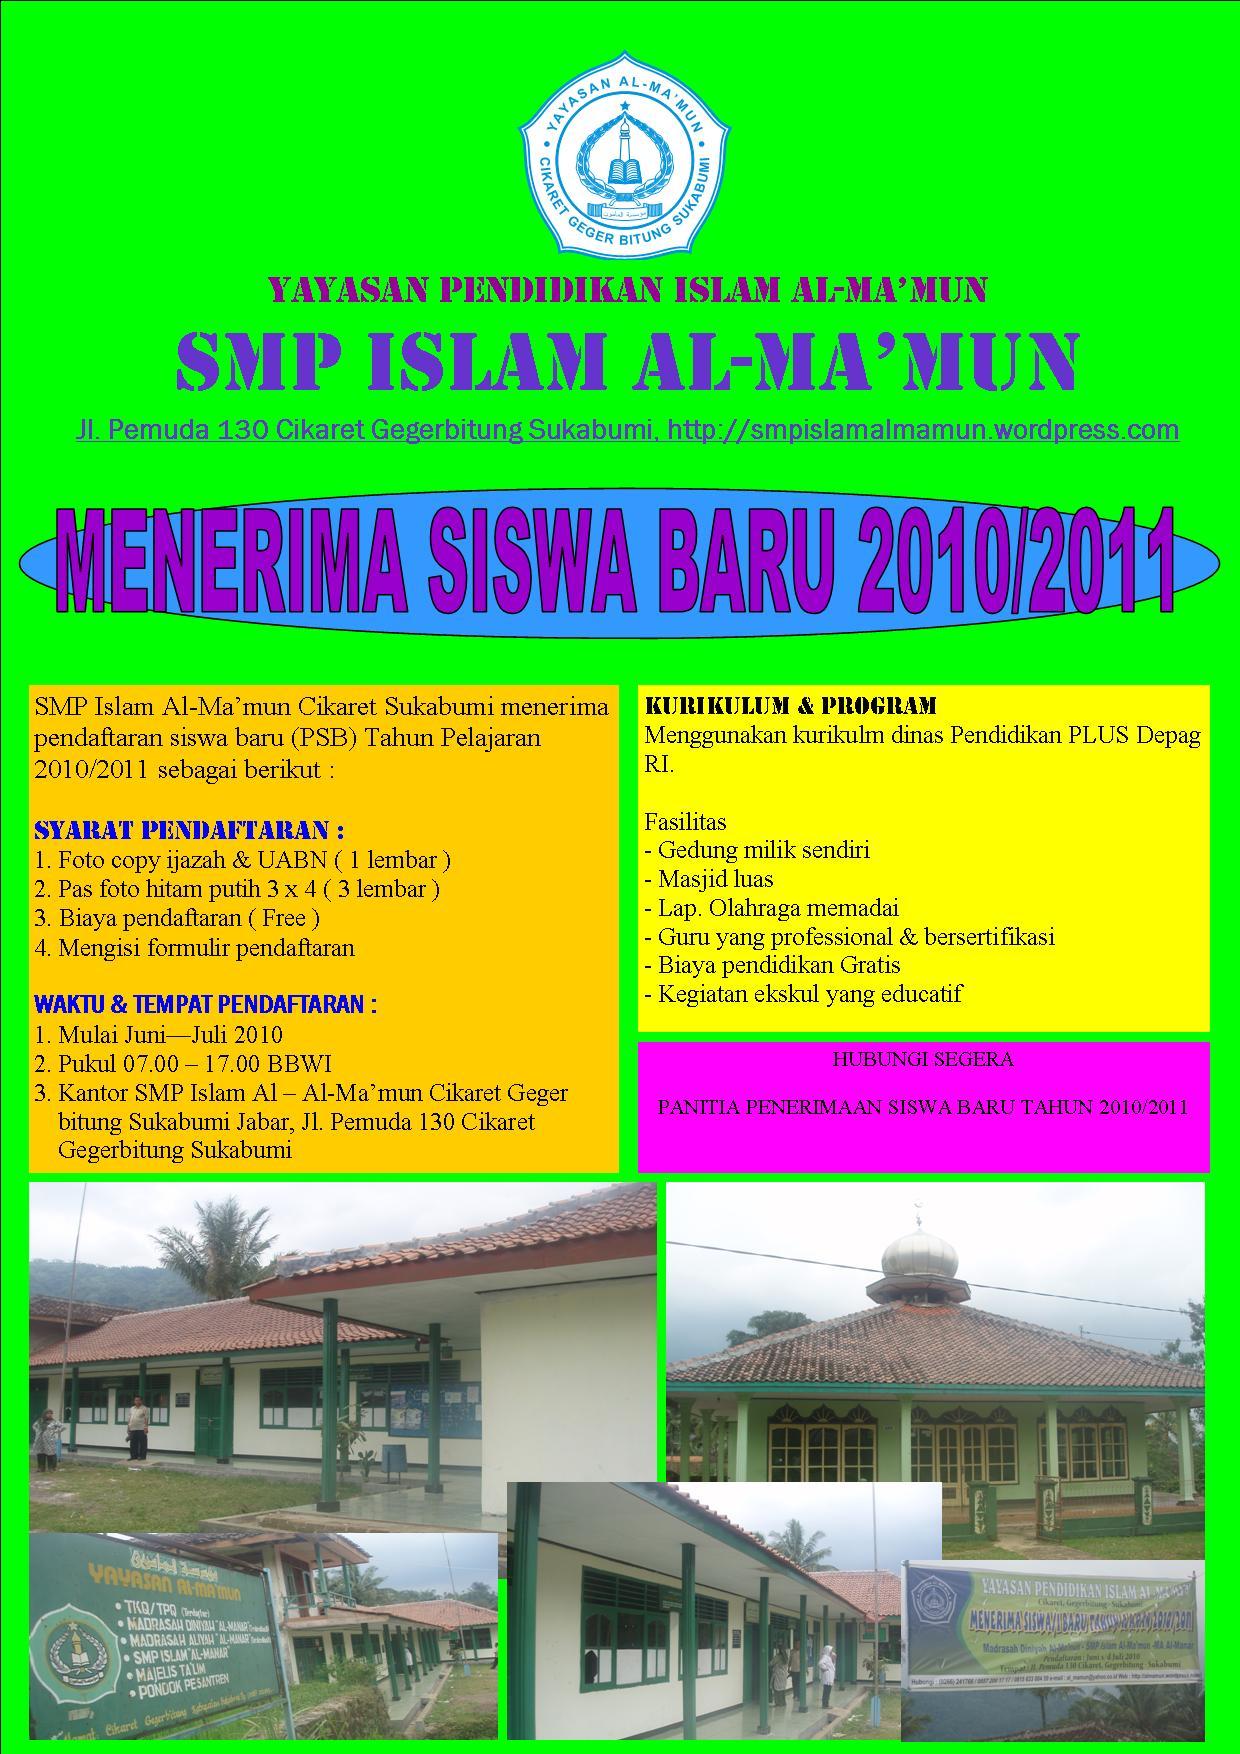 Sudah terdaftar dan mendapat ijin operasional dari Bupati Sukabumim